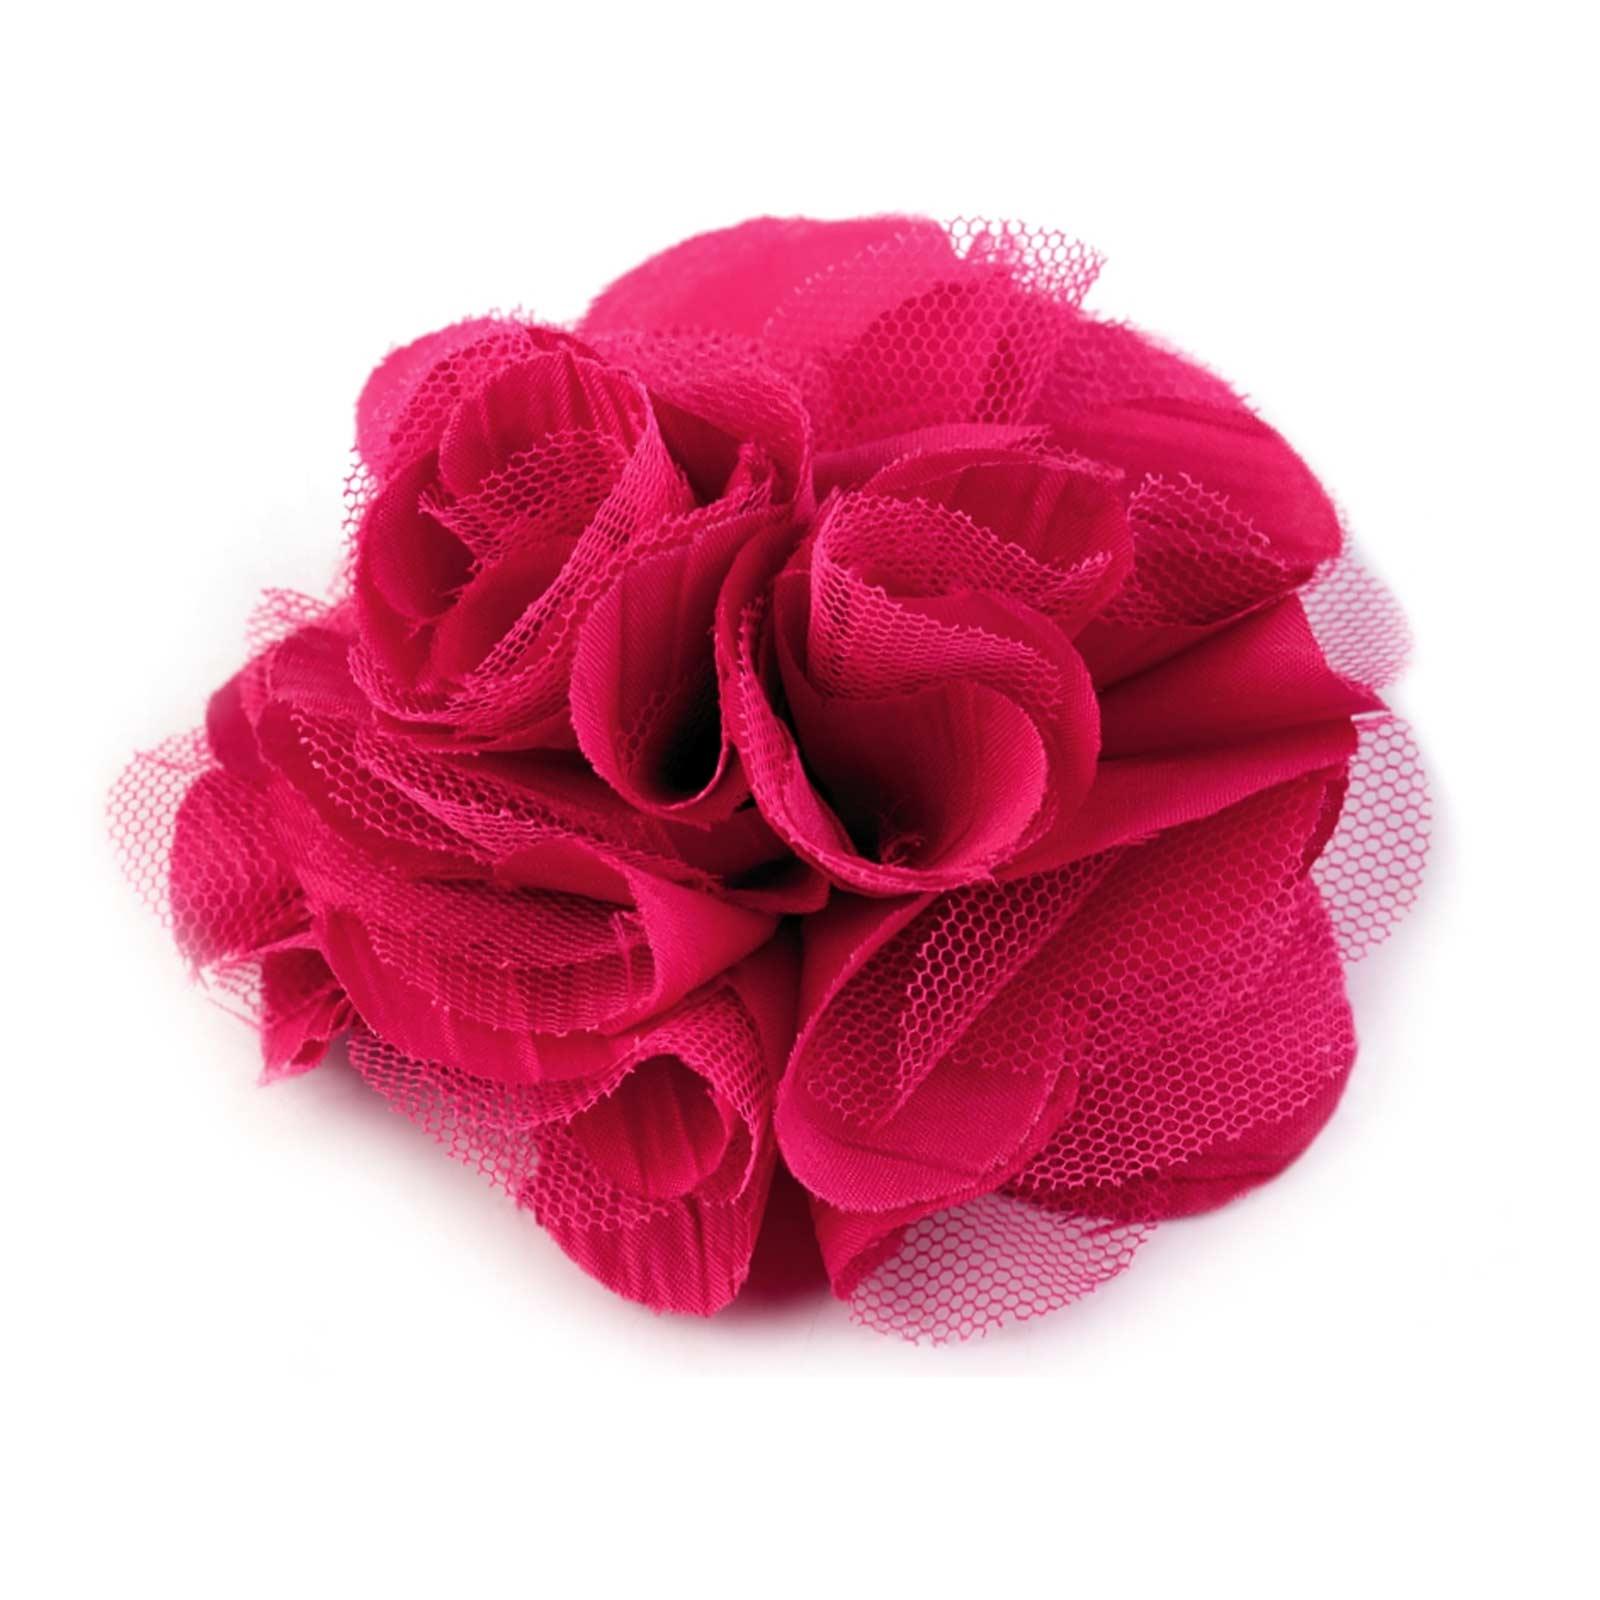 Krokodilspange Rose bordeaux //pink   Neu Haarspange mit Blüte